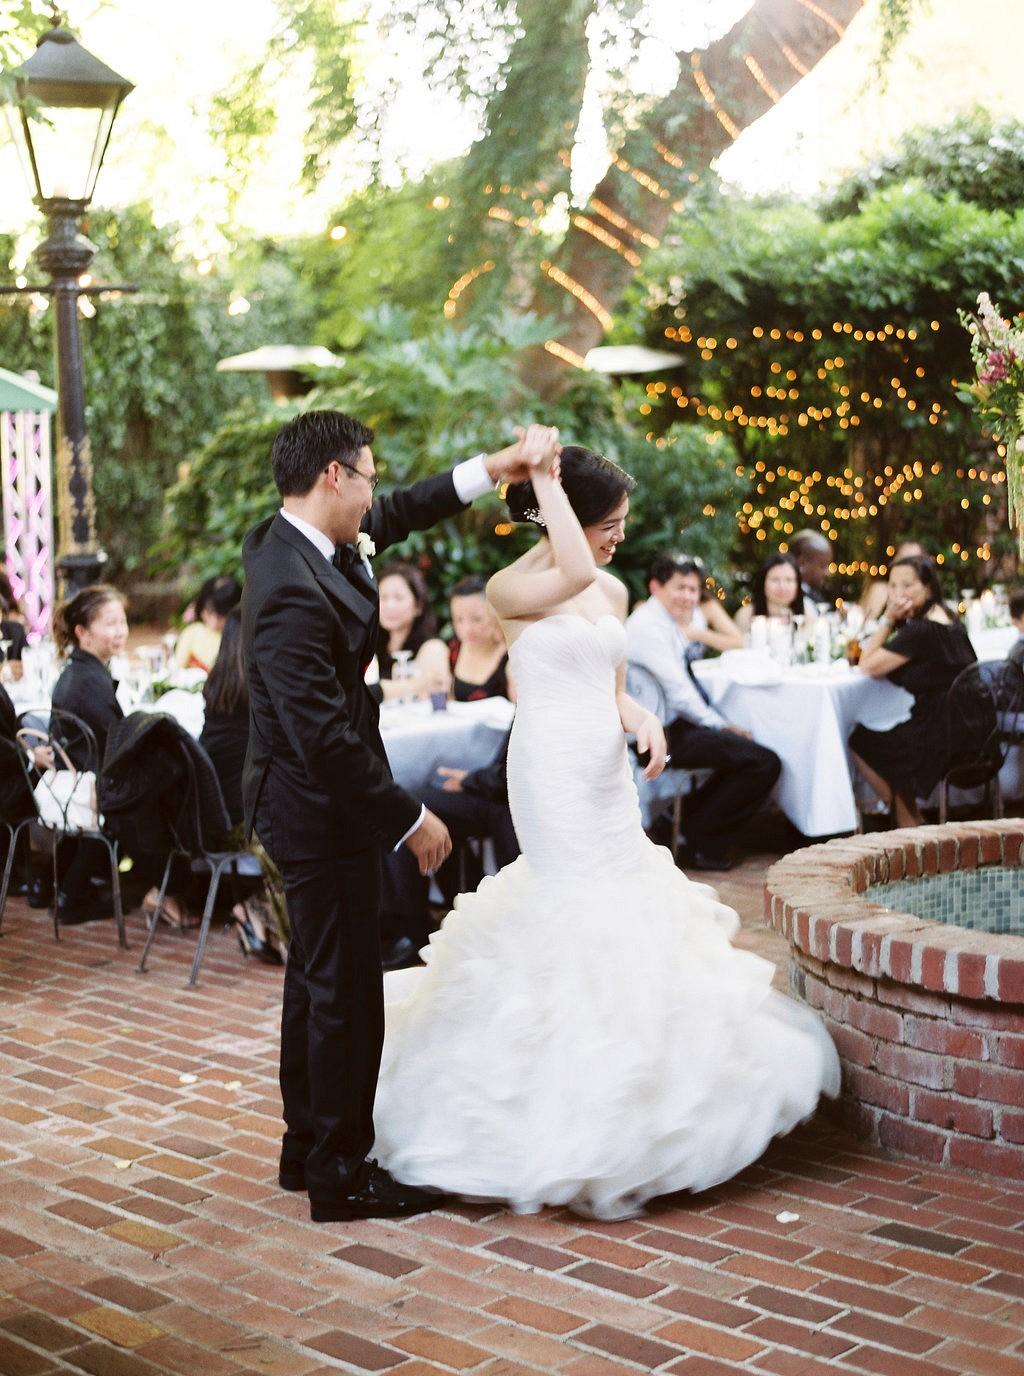 Yolanda and George's Garden Wedding with Eucalyptus Gardland